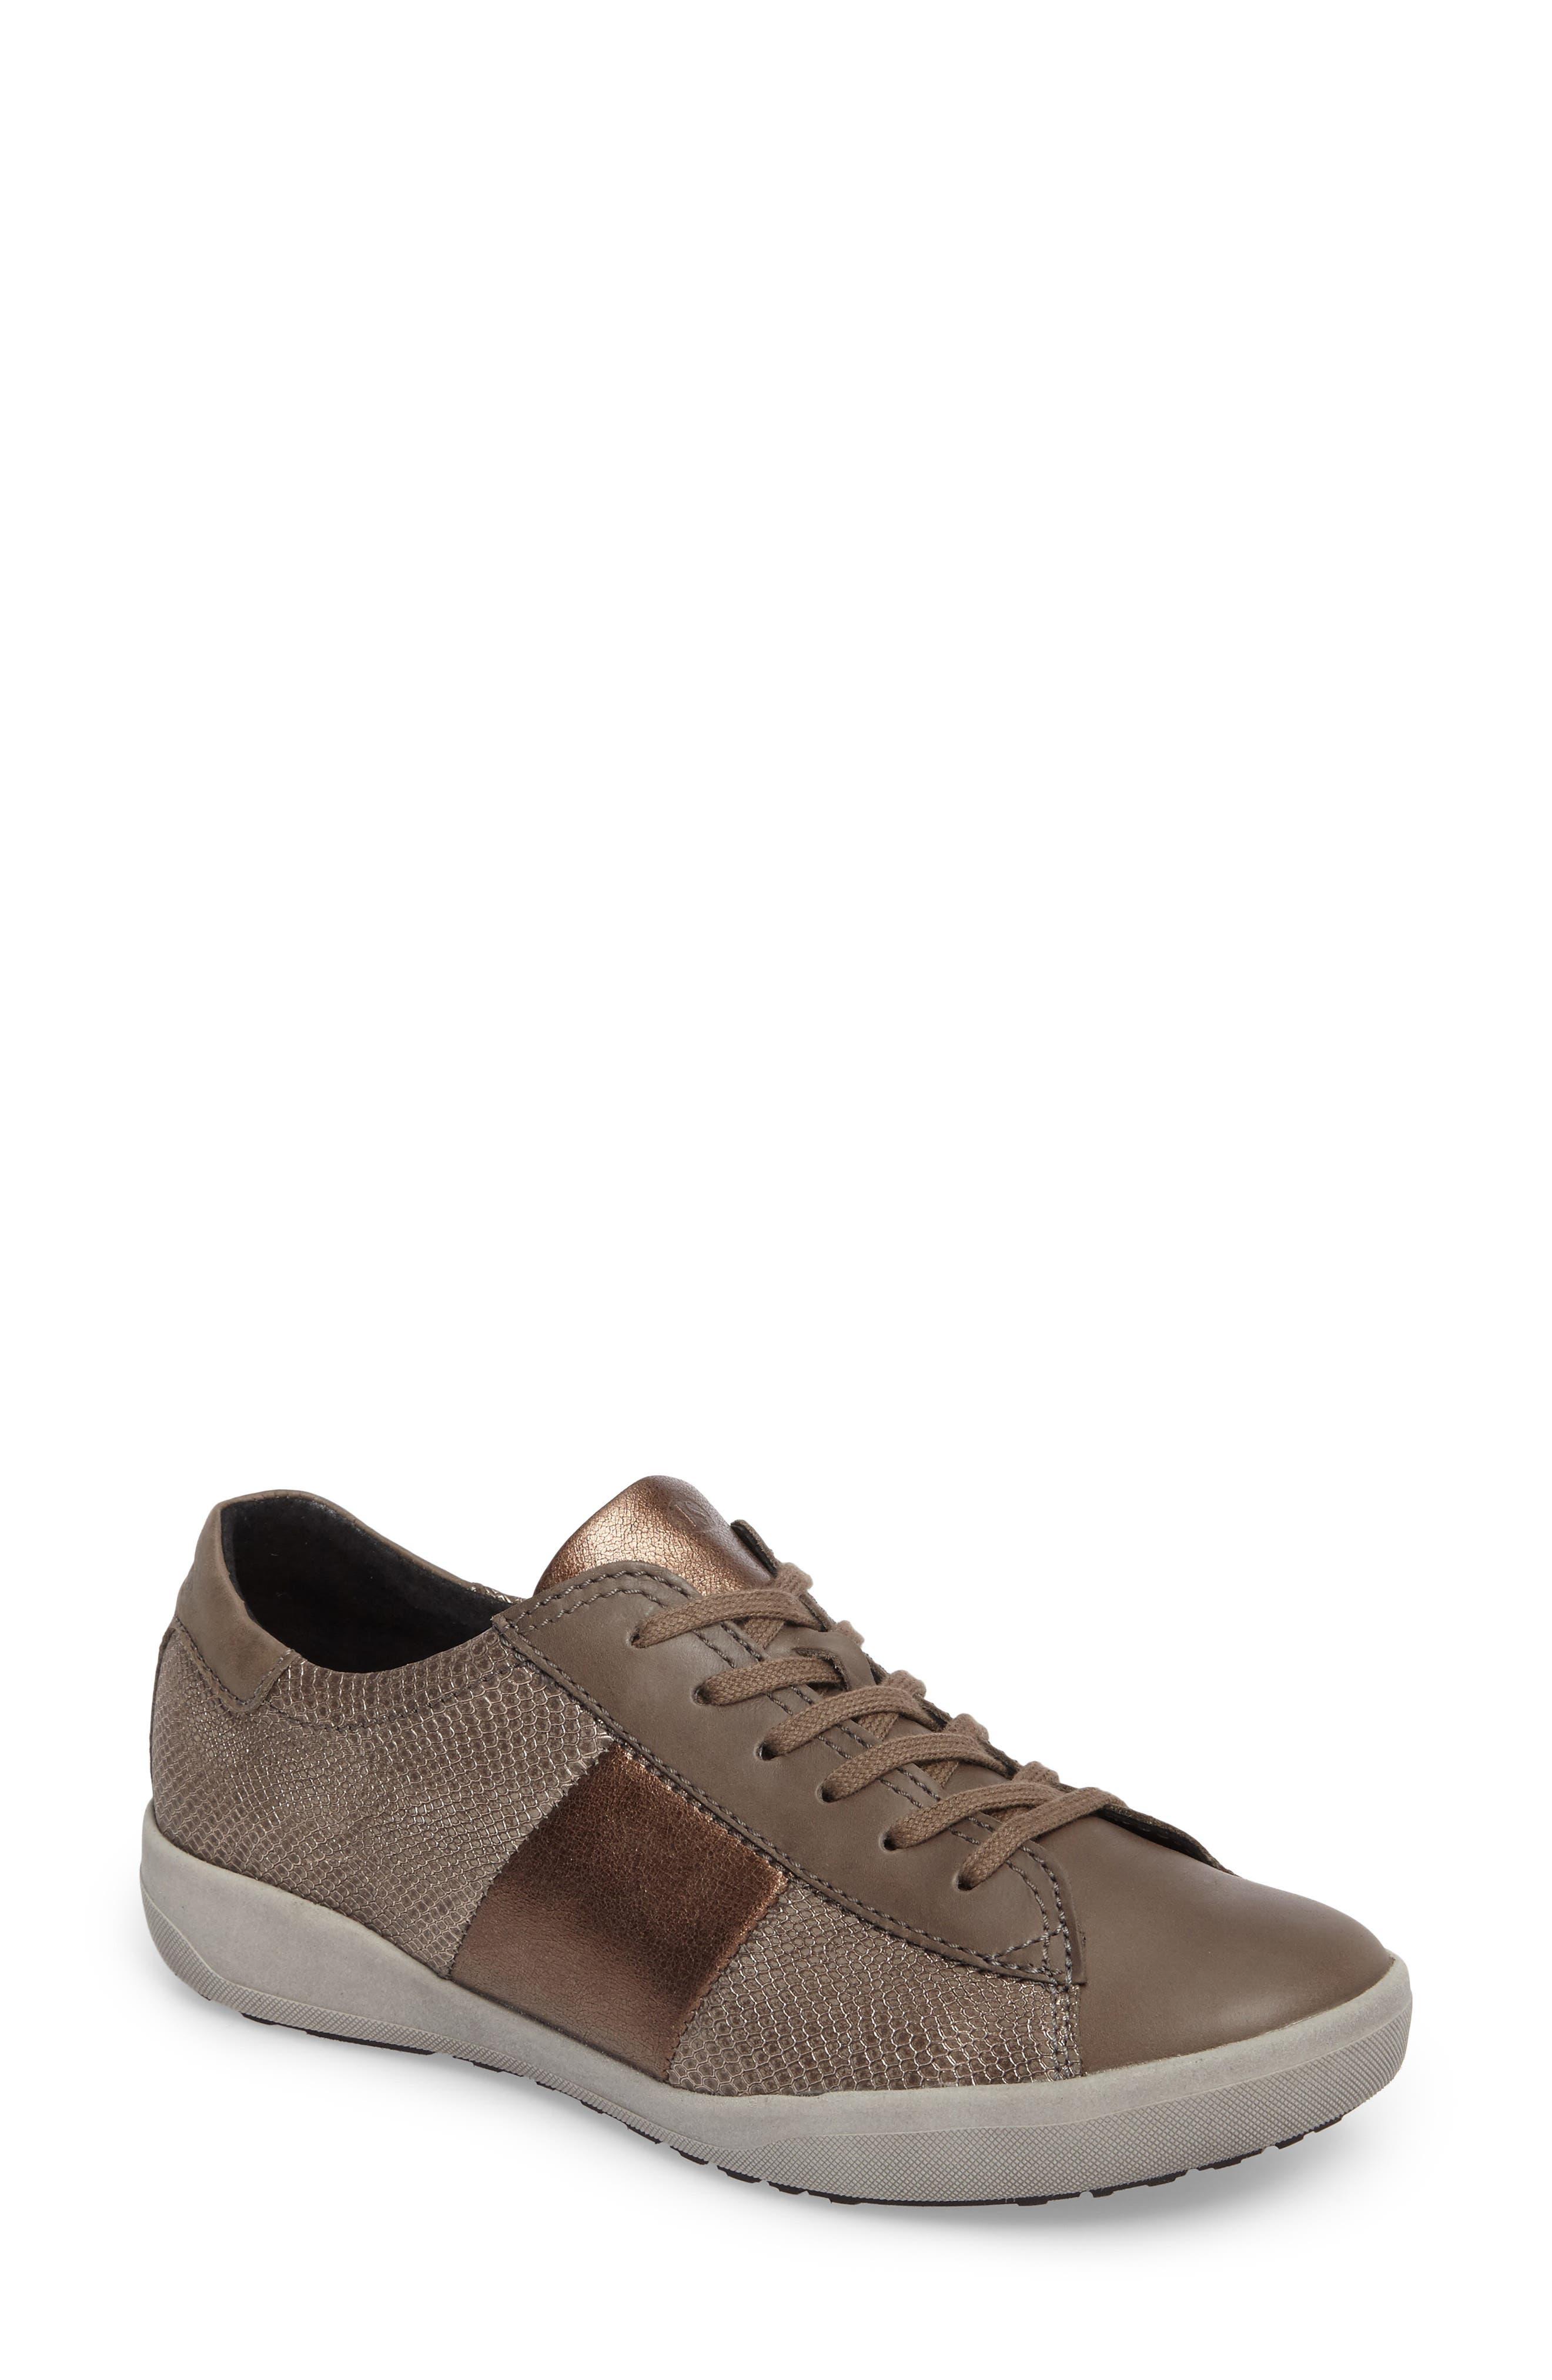 Sina 27 Sneaker,                         Main,                         color, Asphalt/ Kombi Leather